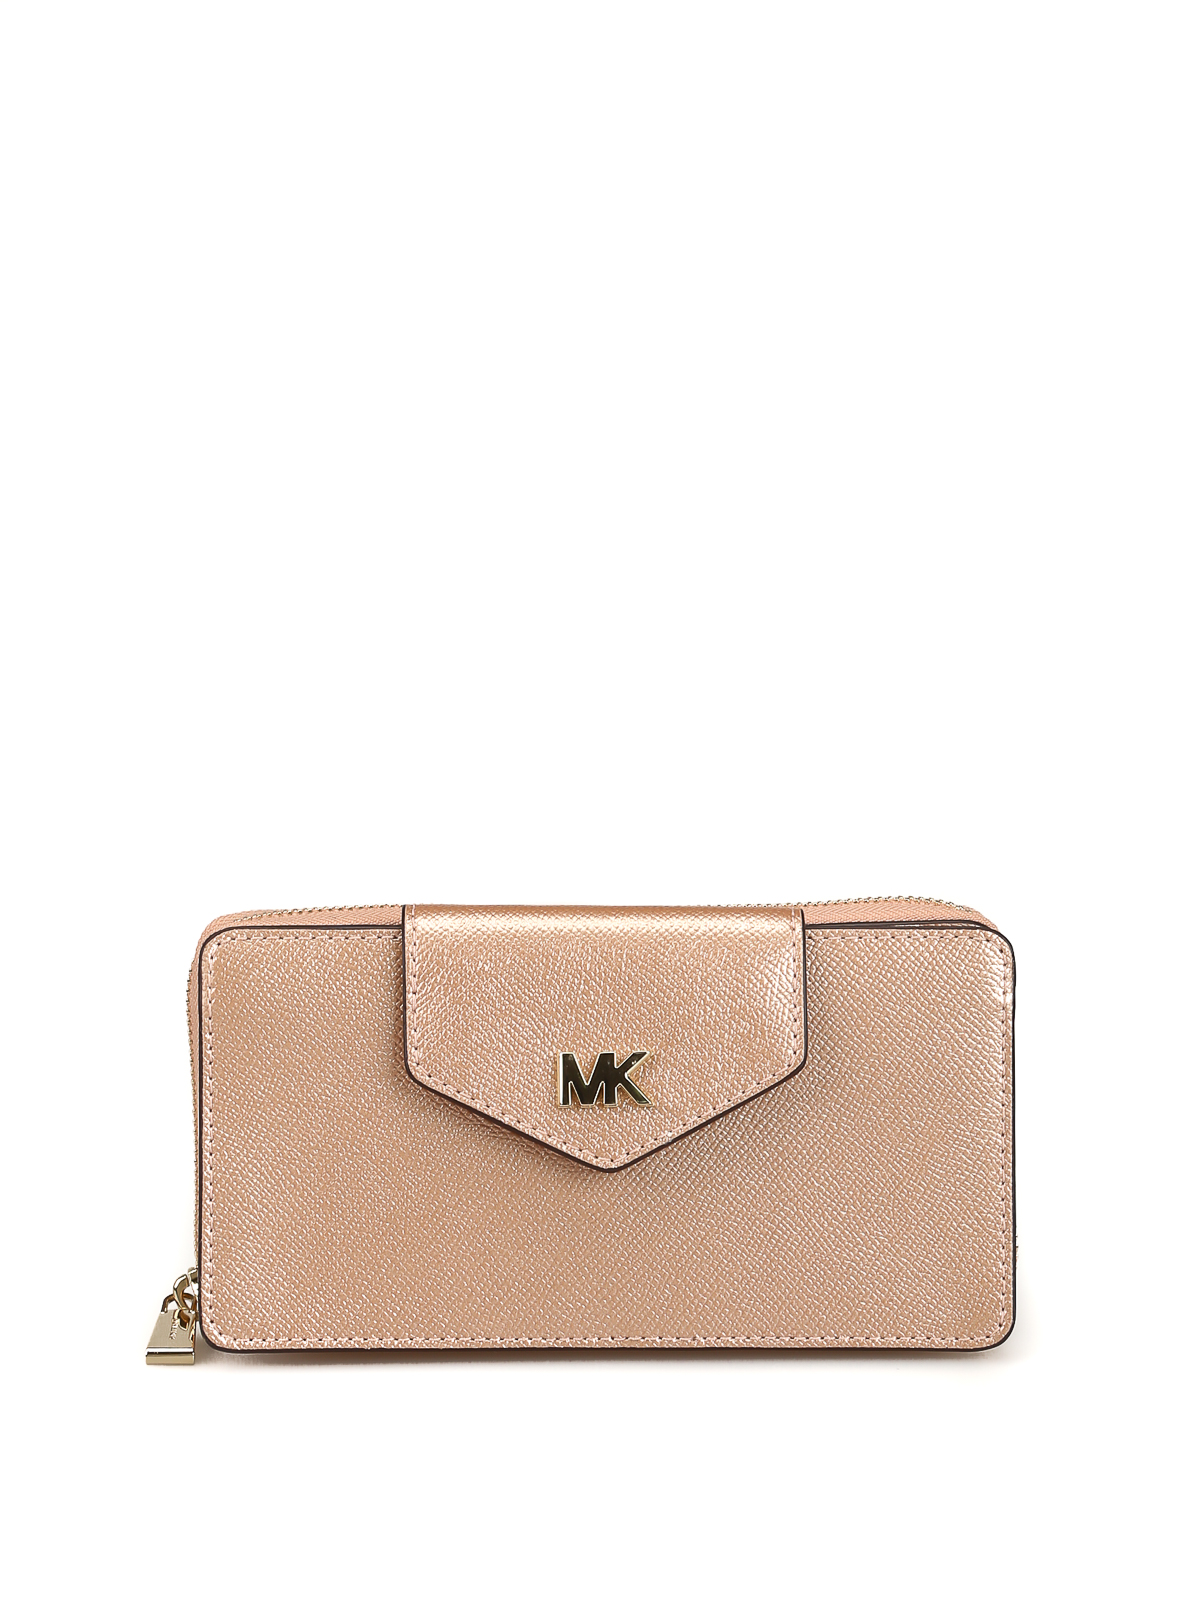 Michael Kors Pink metallic leather crossbody bag cross